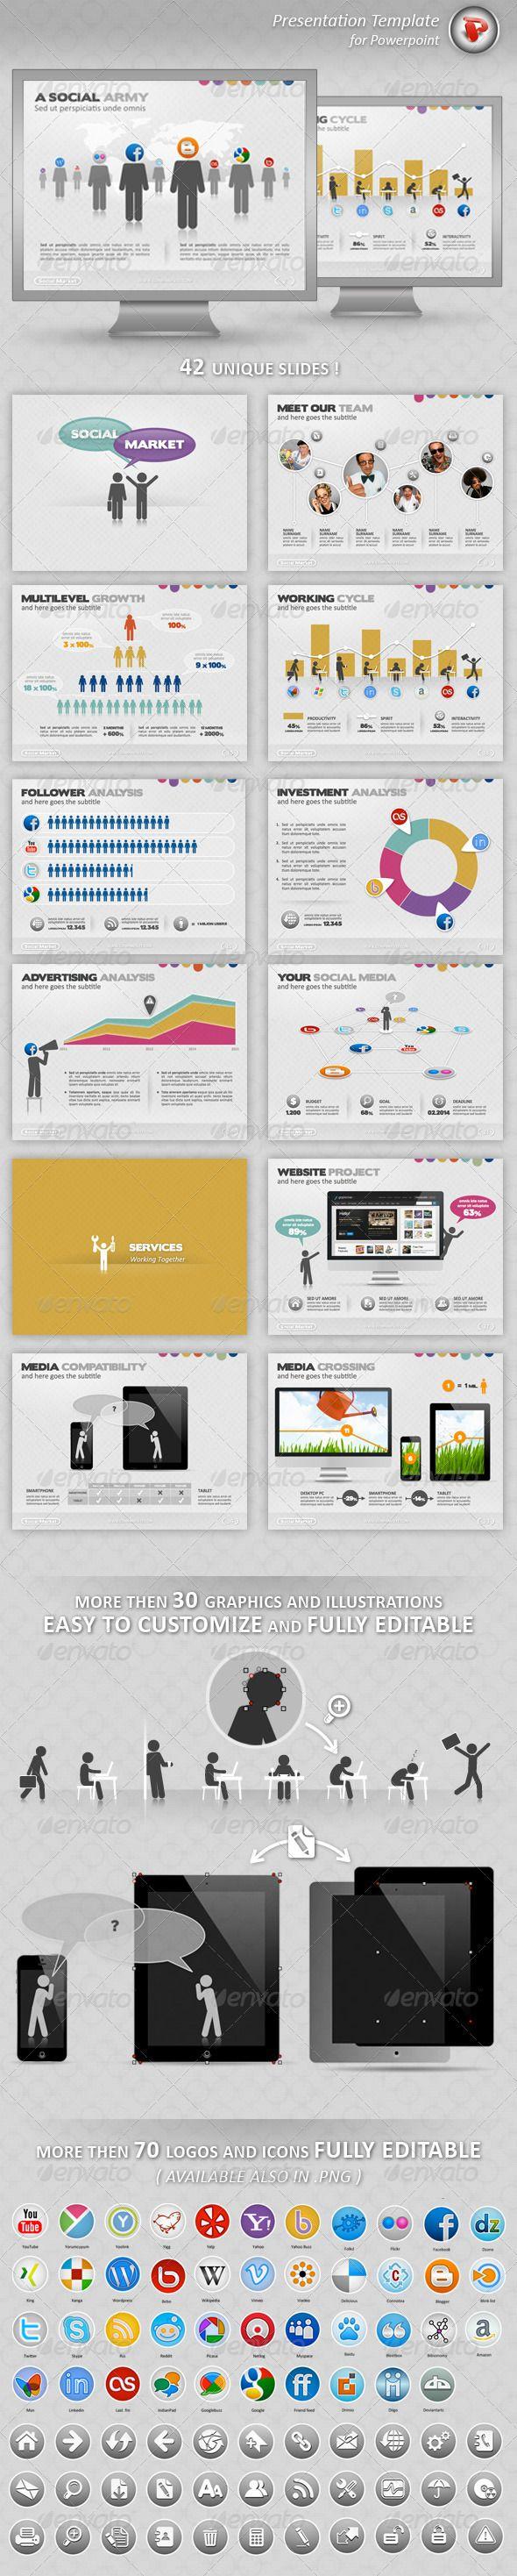 Social Market Powerpoint Presentation - Powerpoint Templates Presentation Templates